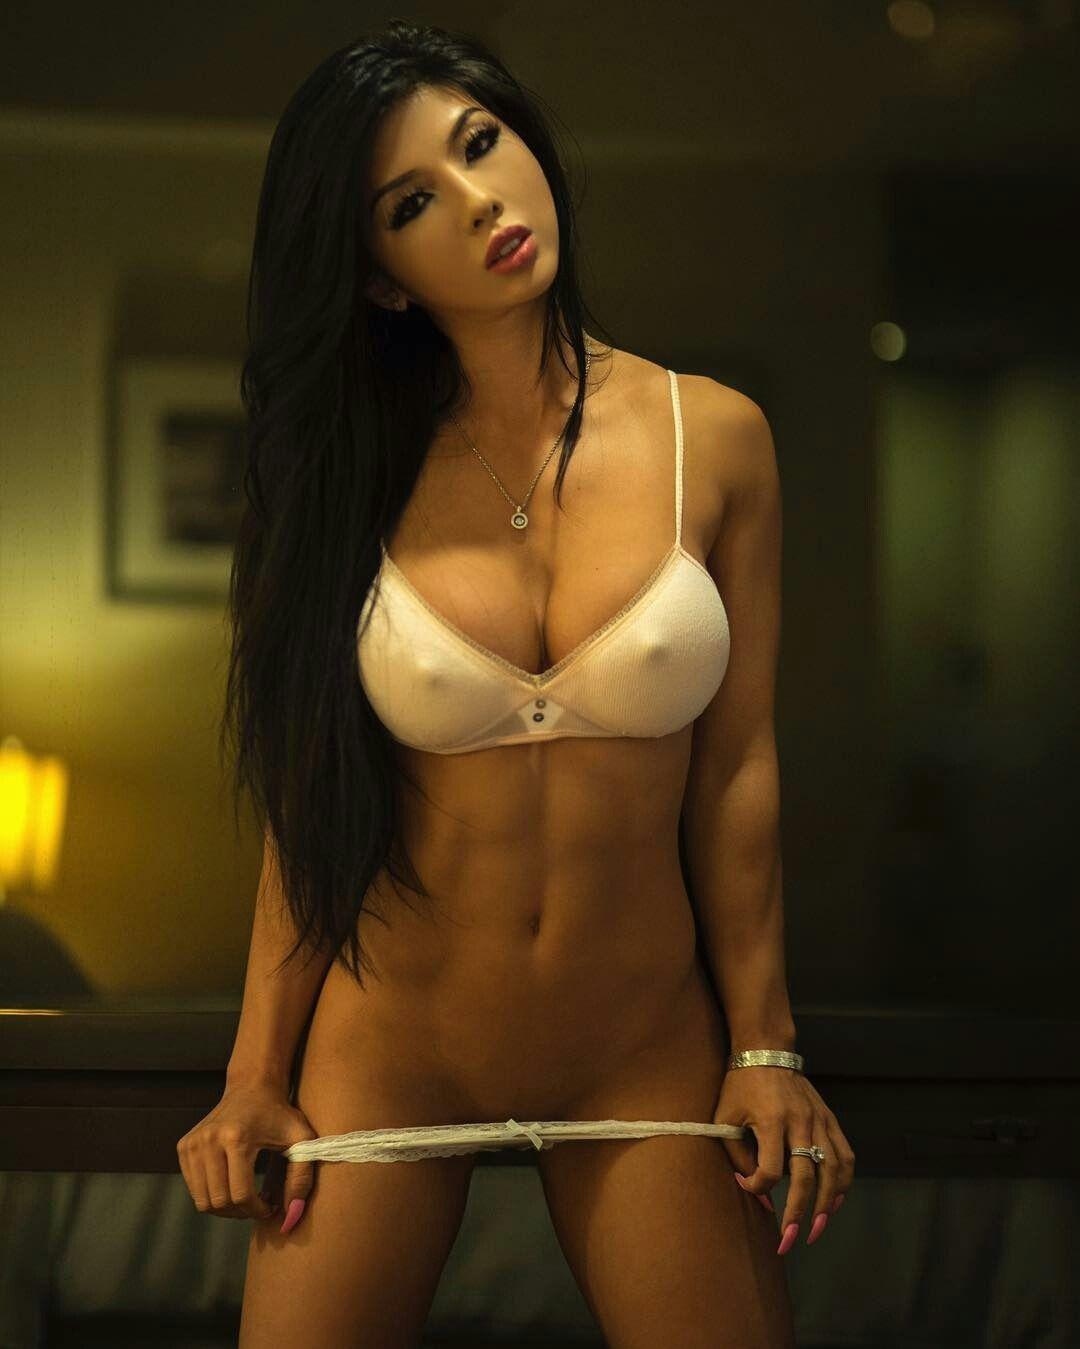 Strong sexy legs nude girl